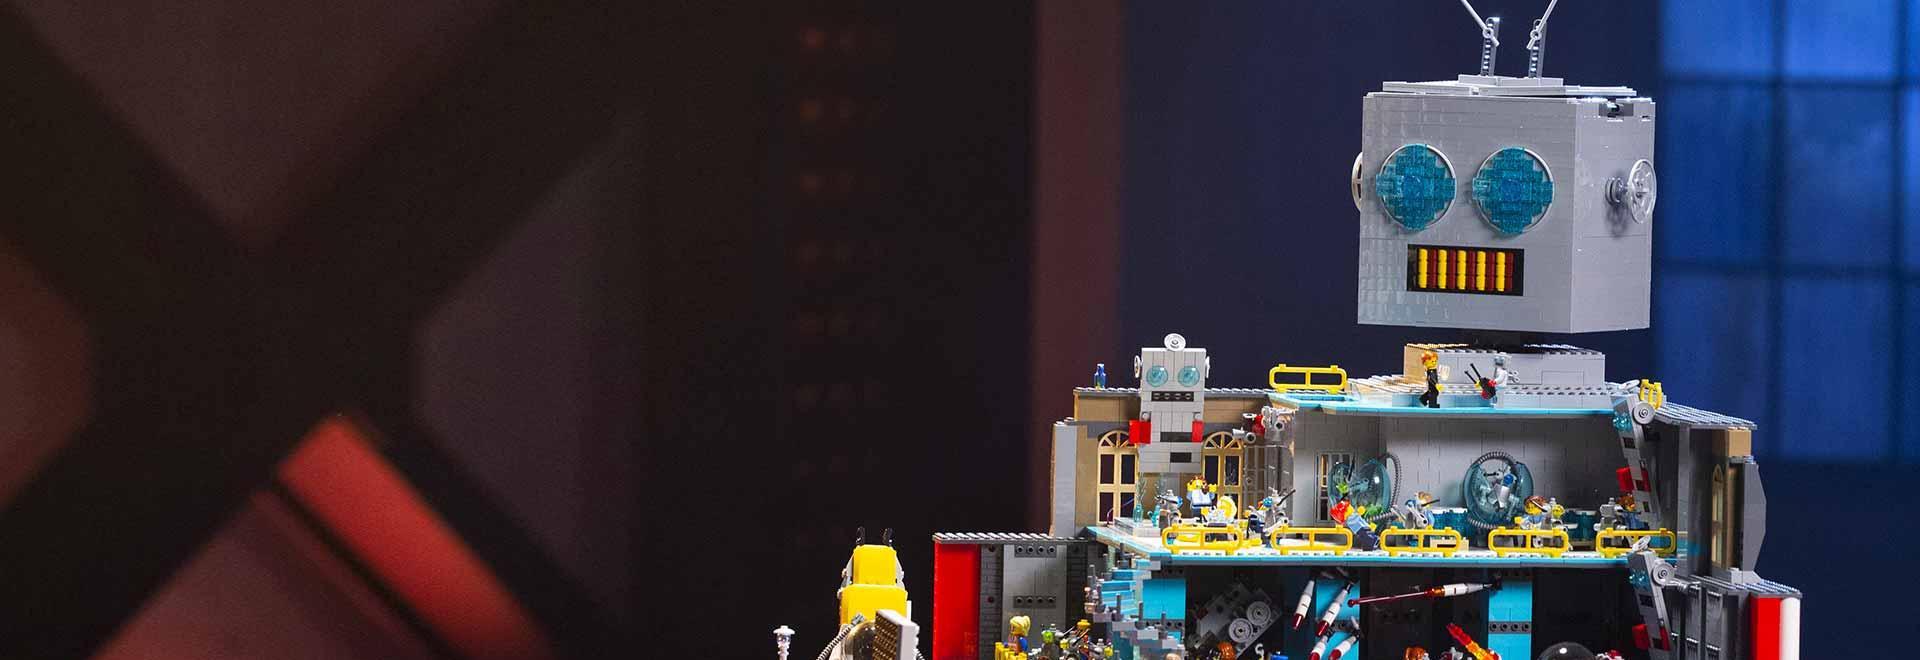 Lego campione!